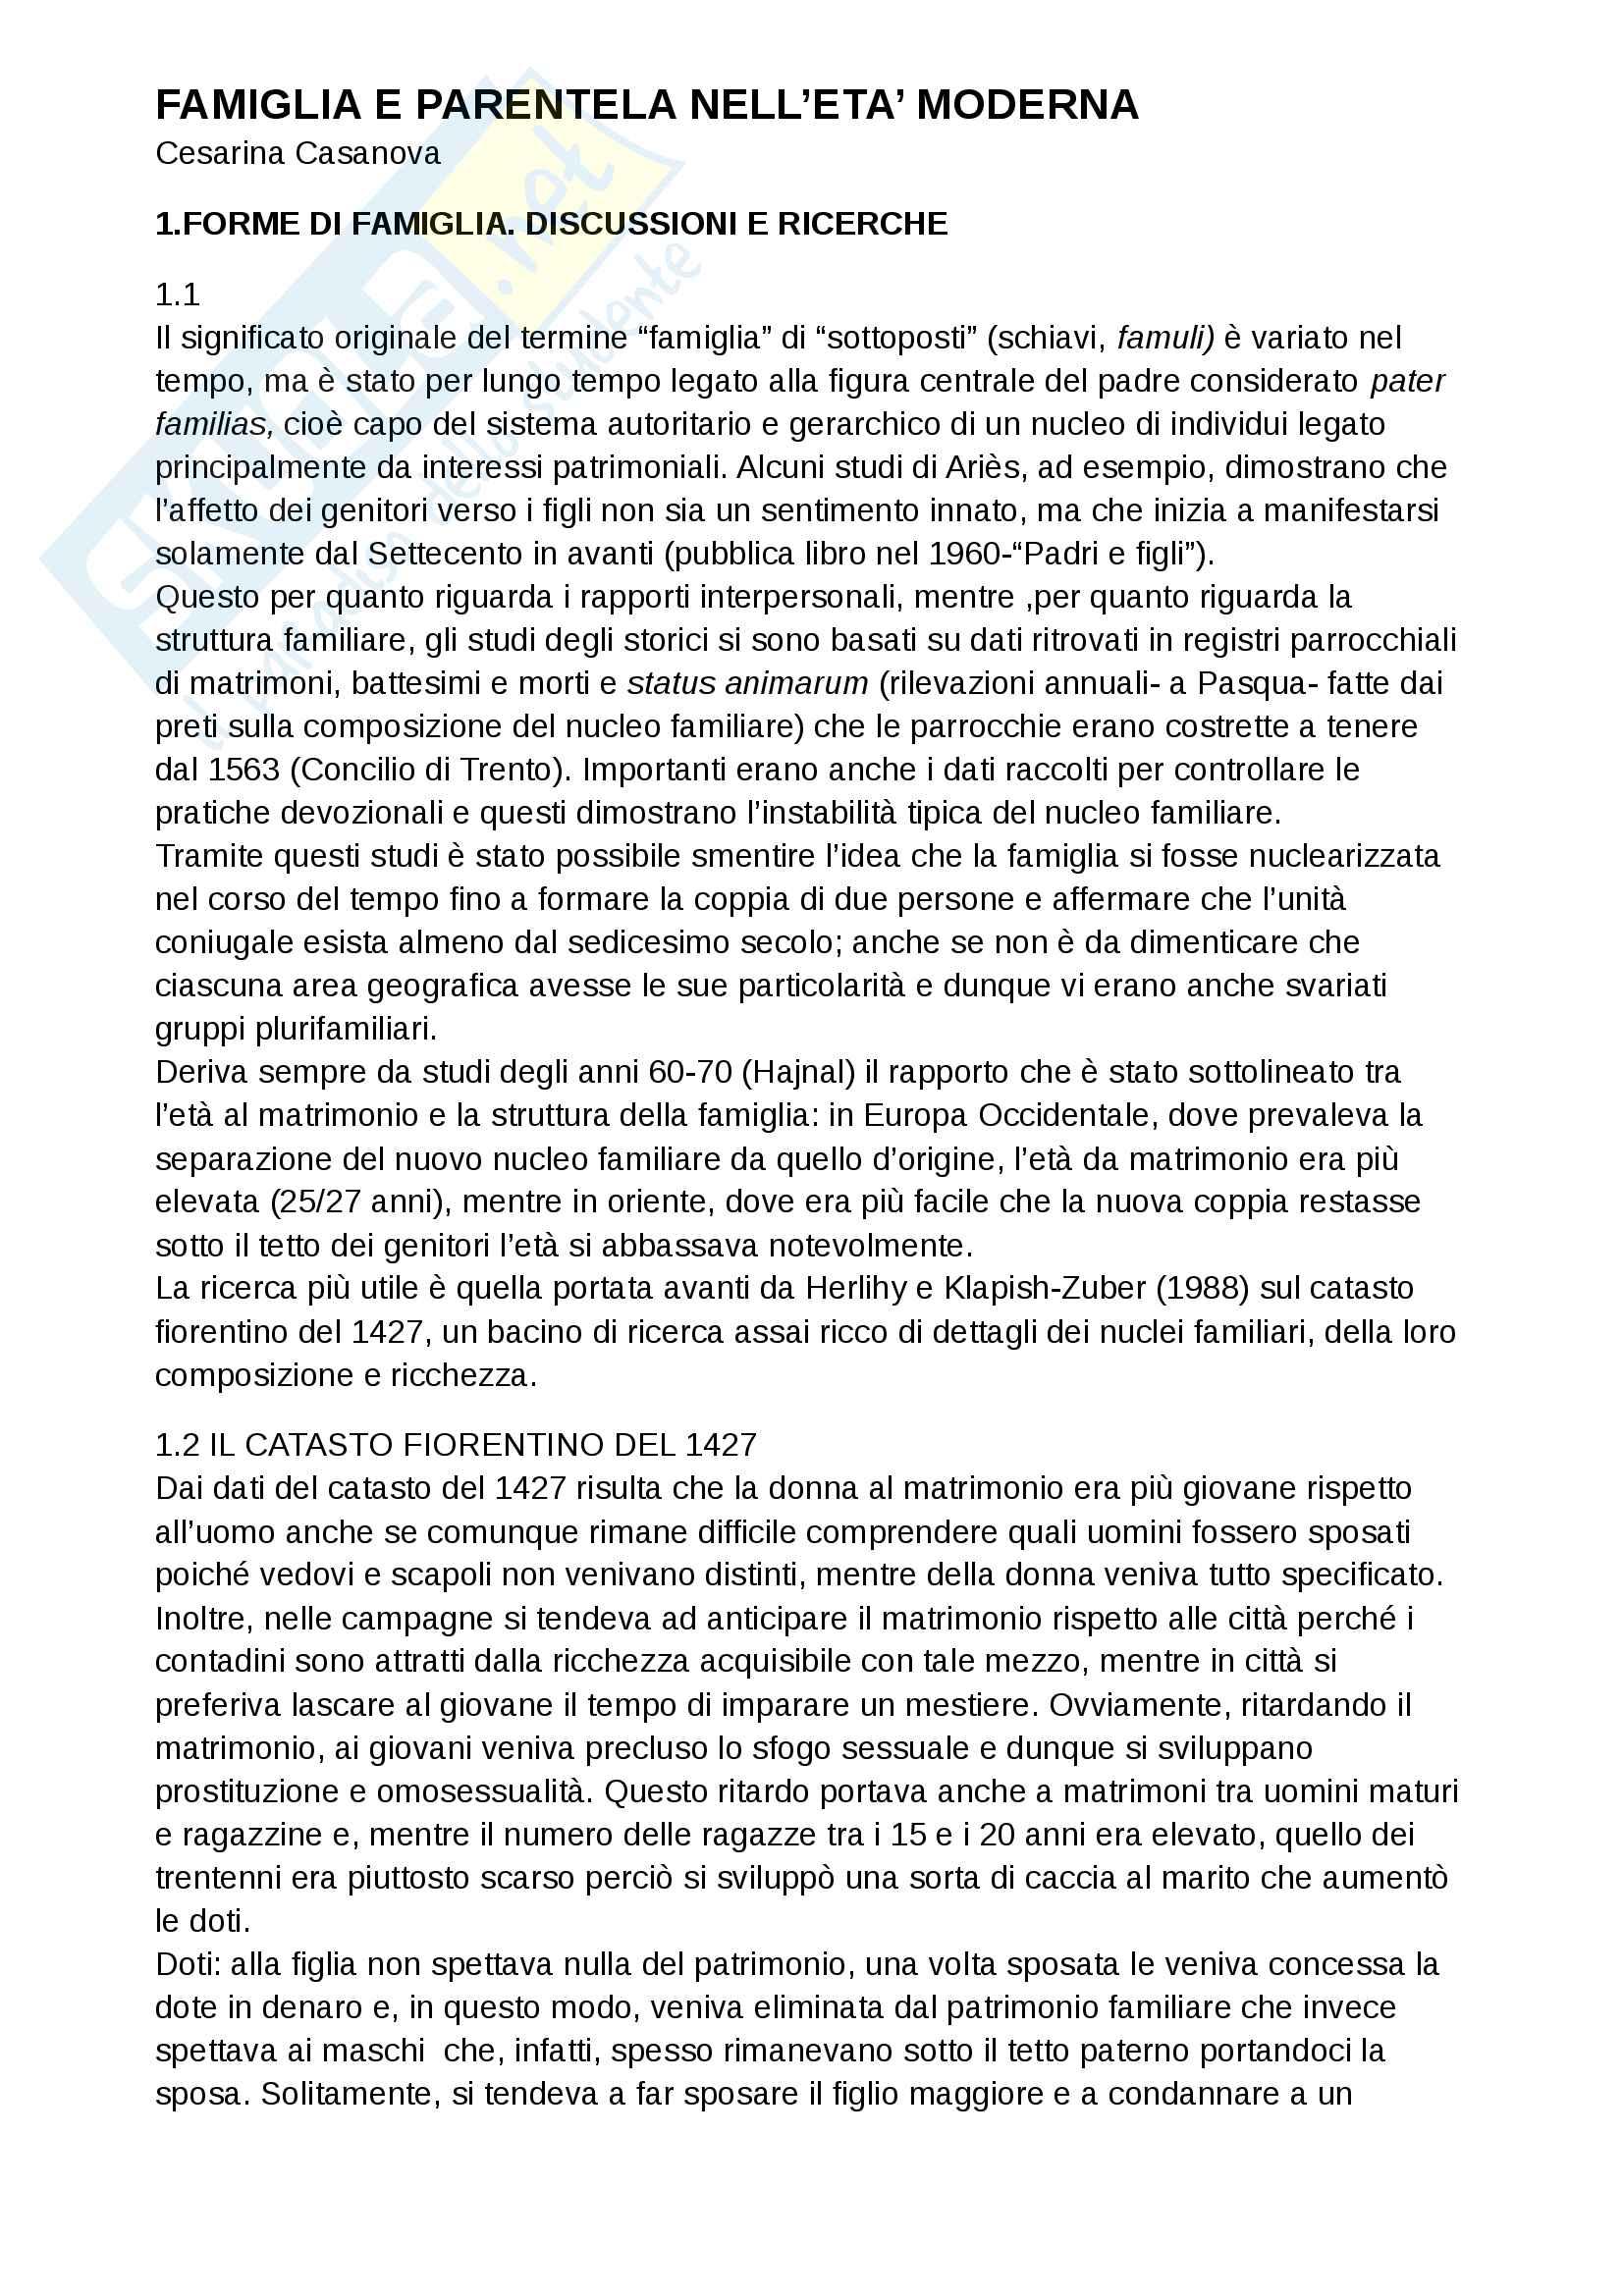 "Riassunto esame di Storia moderna, prof. Marina Cavallera, libro consigliato ""Famiglia e parentela nell'età moderna"", Cesarina Casanova"